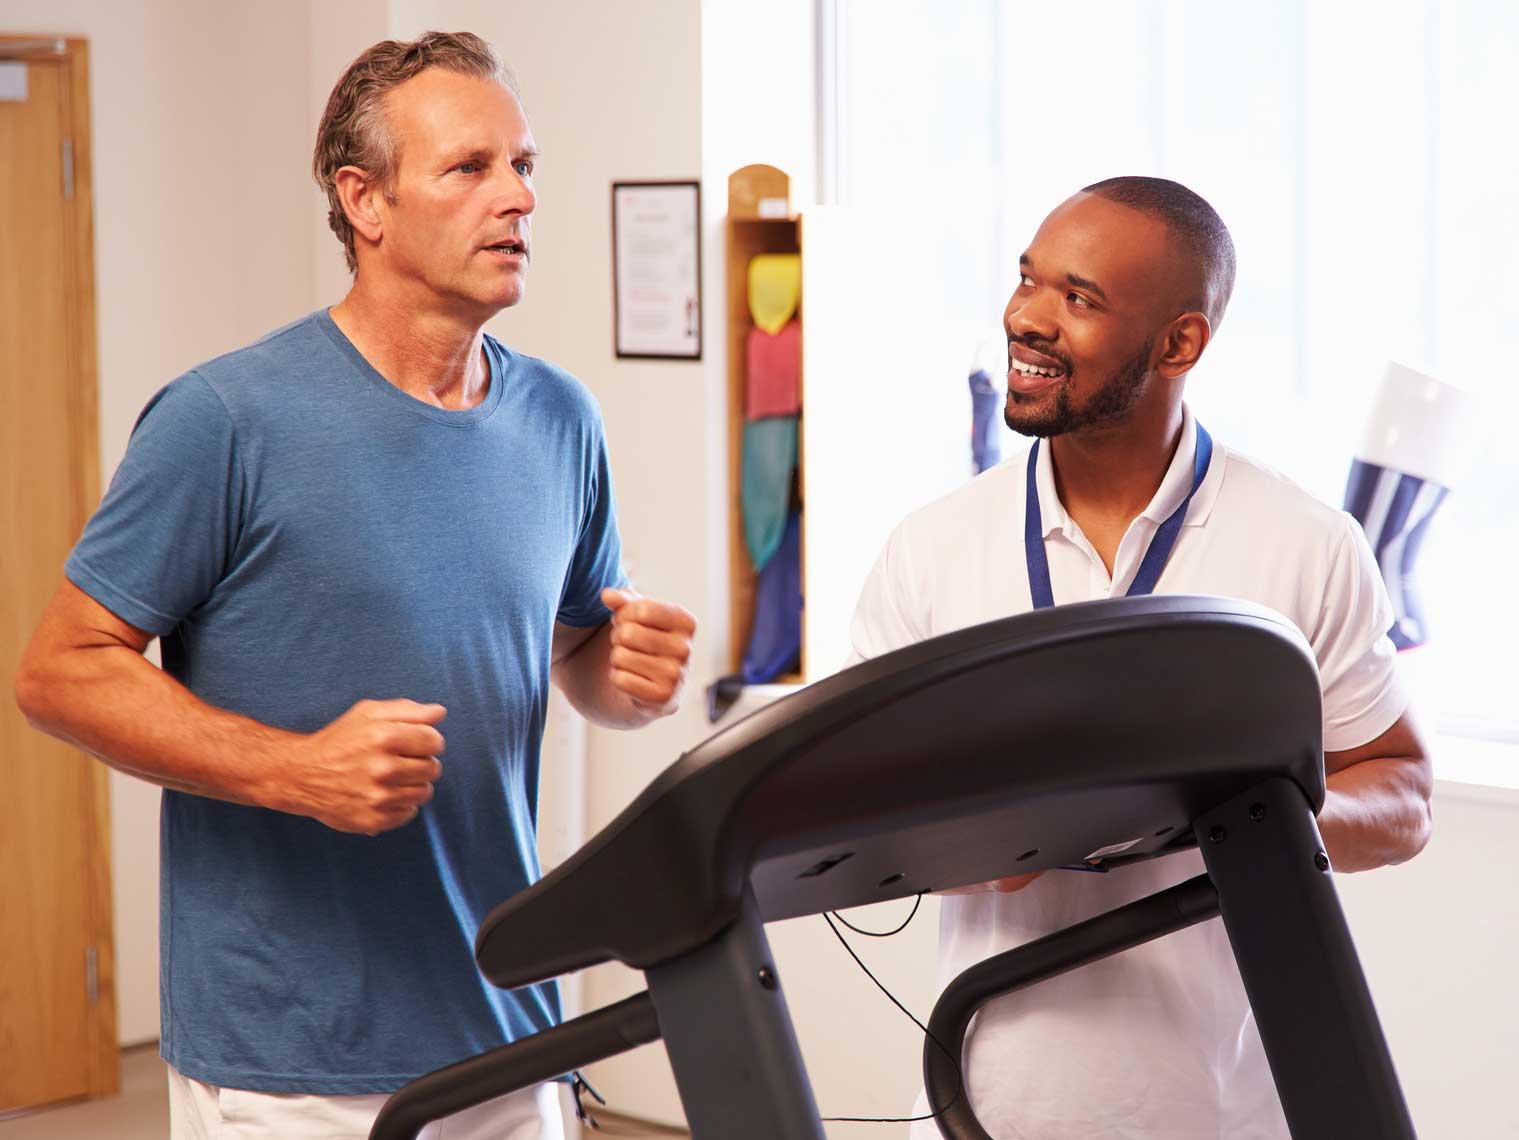 Windham Cardiac Rehabilitation Receives National Accreditation